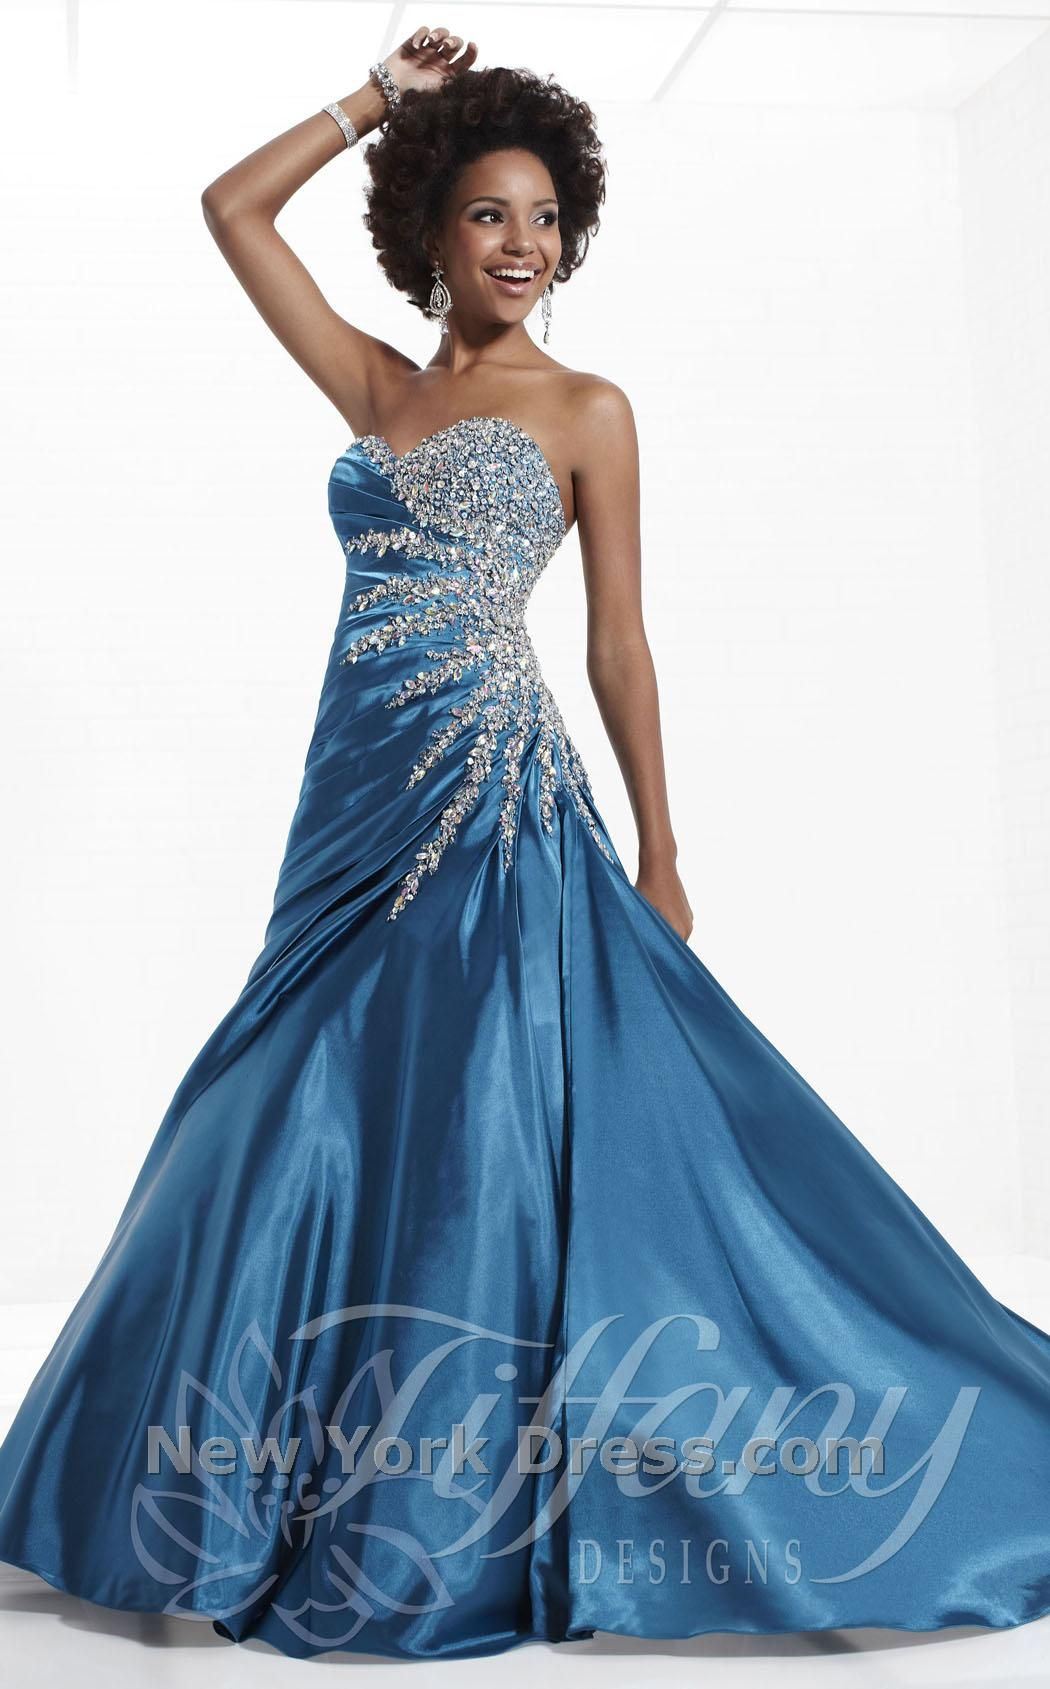 Tiffany dress tiffany dream prom and prom